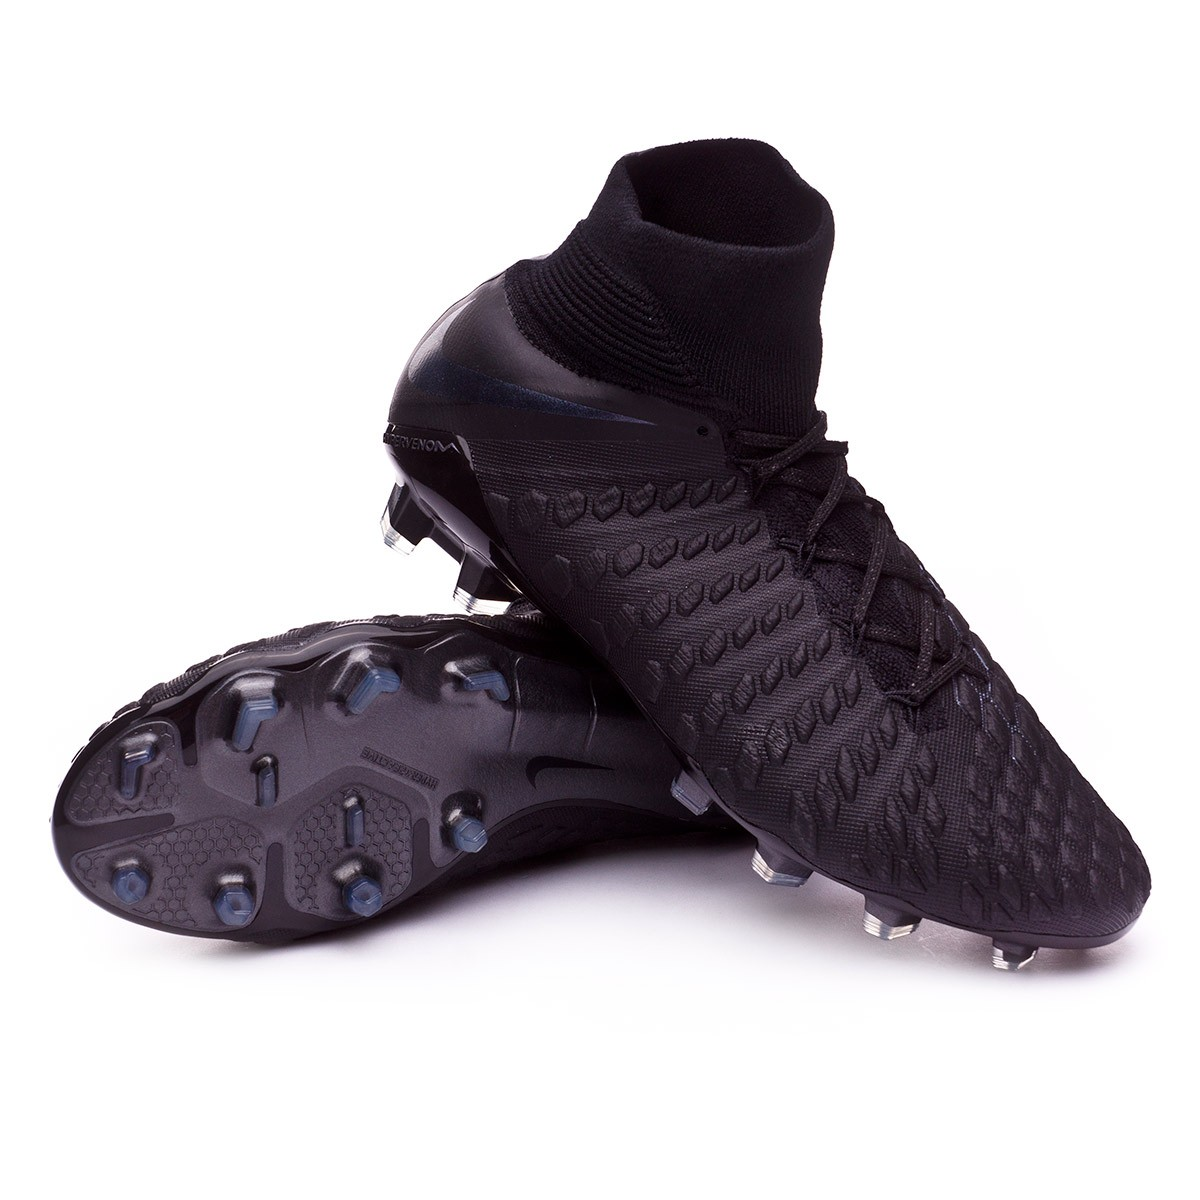 sports shoes 393b4 97c8e Bota Hypervenom Phantom III Elite DF FG Black